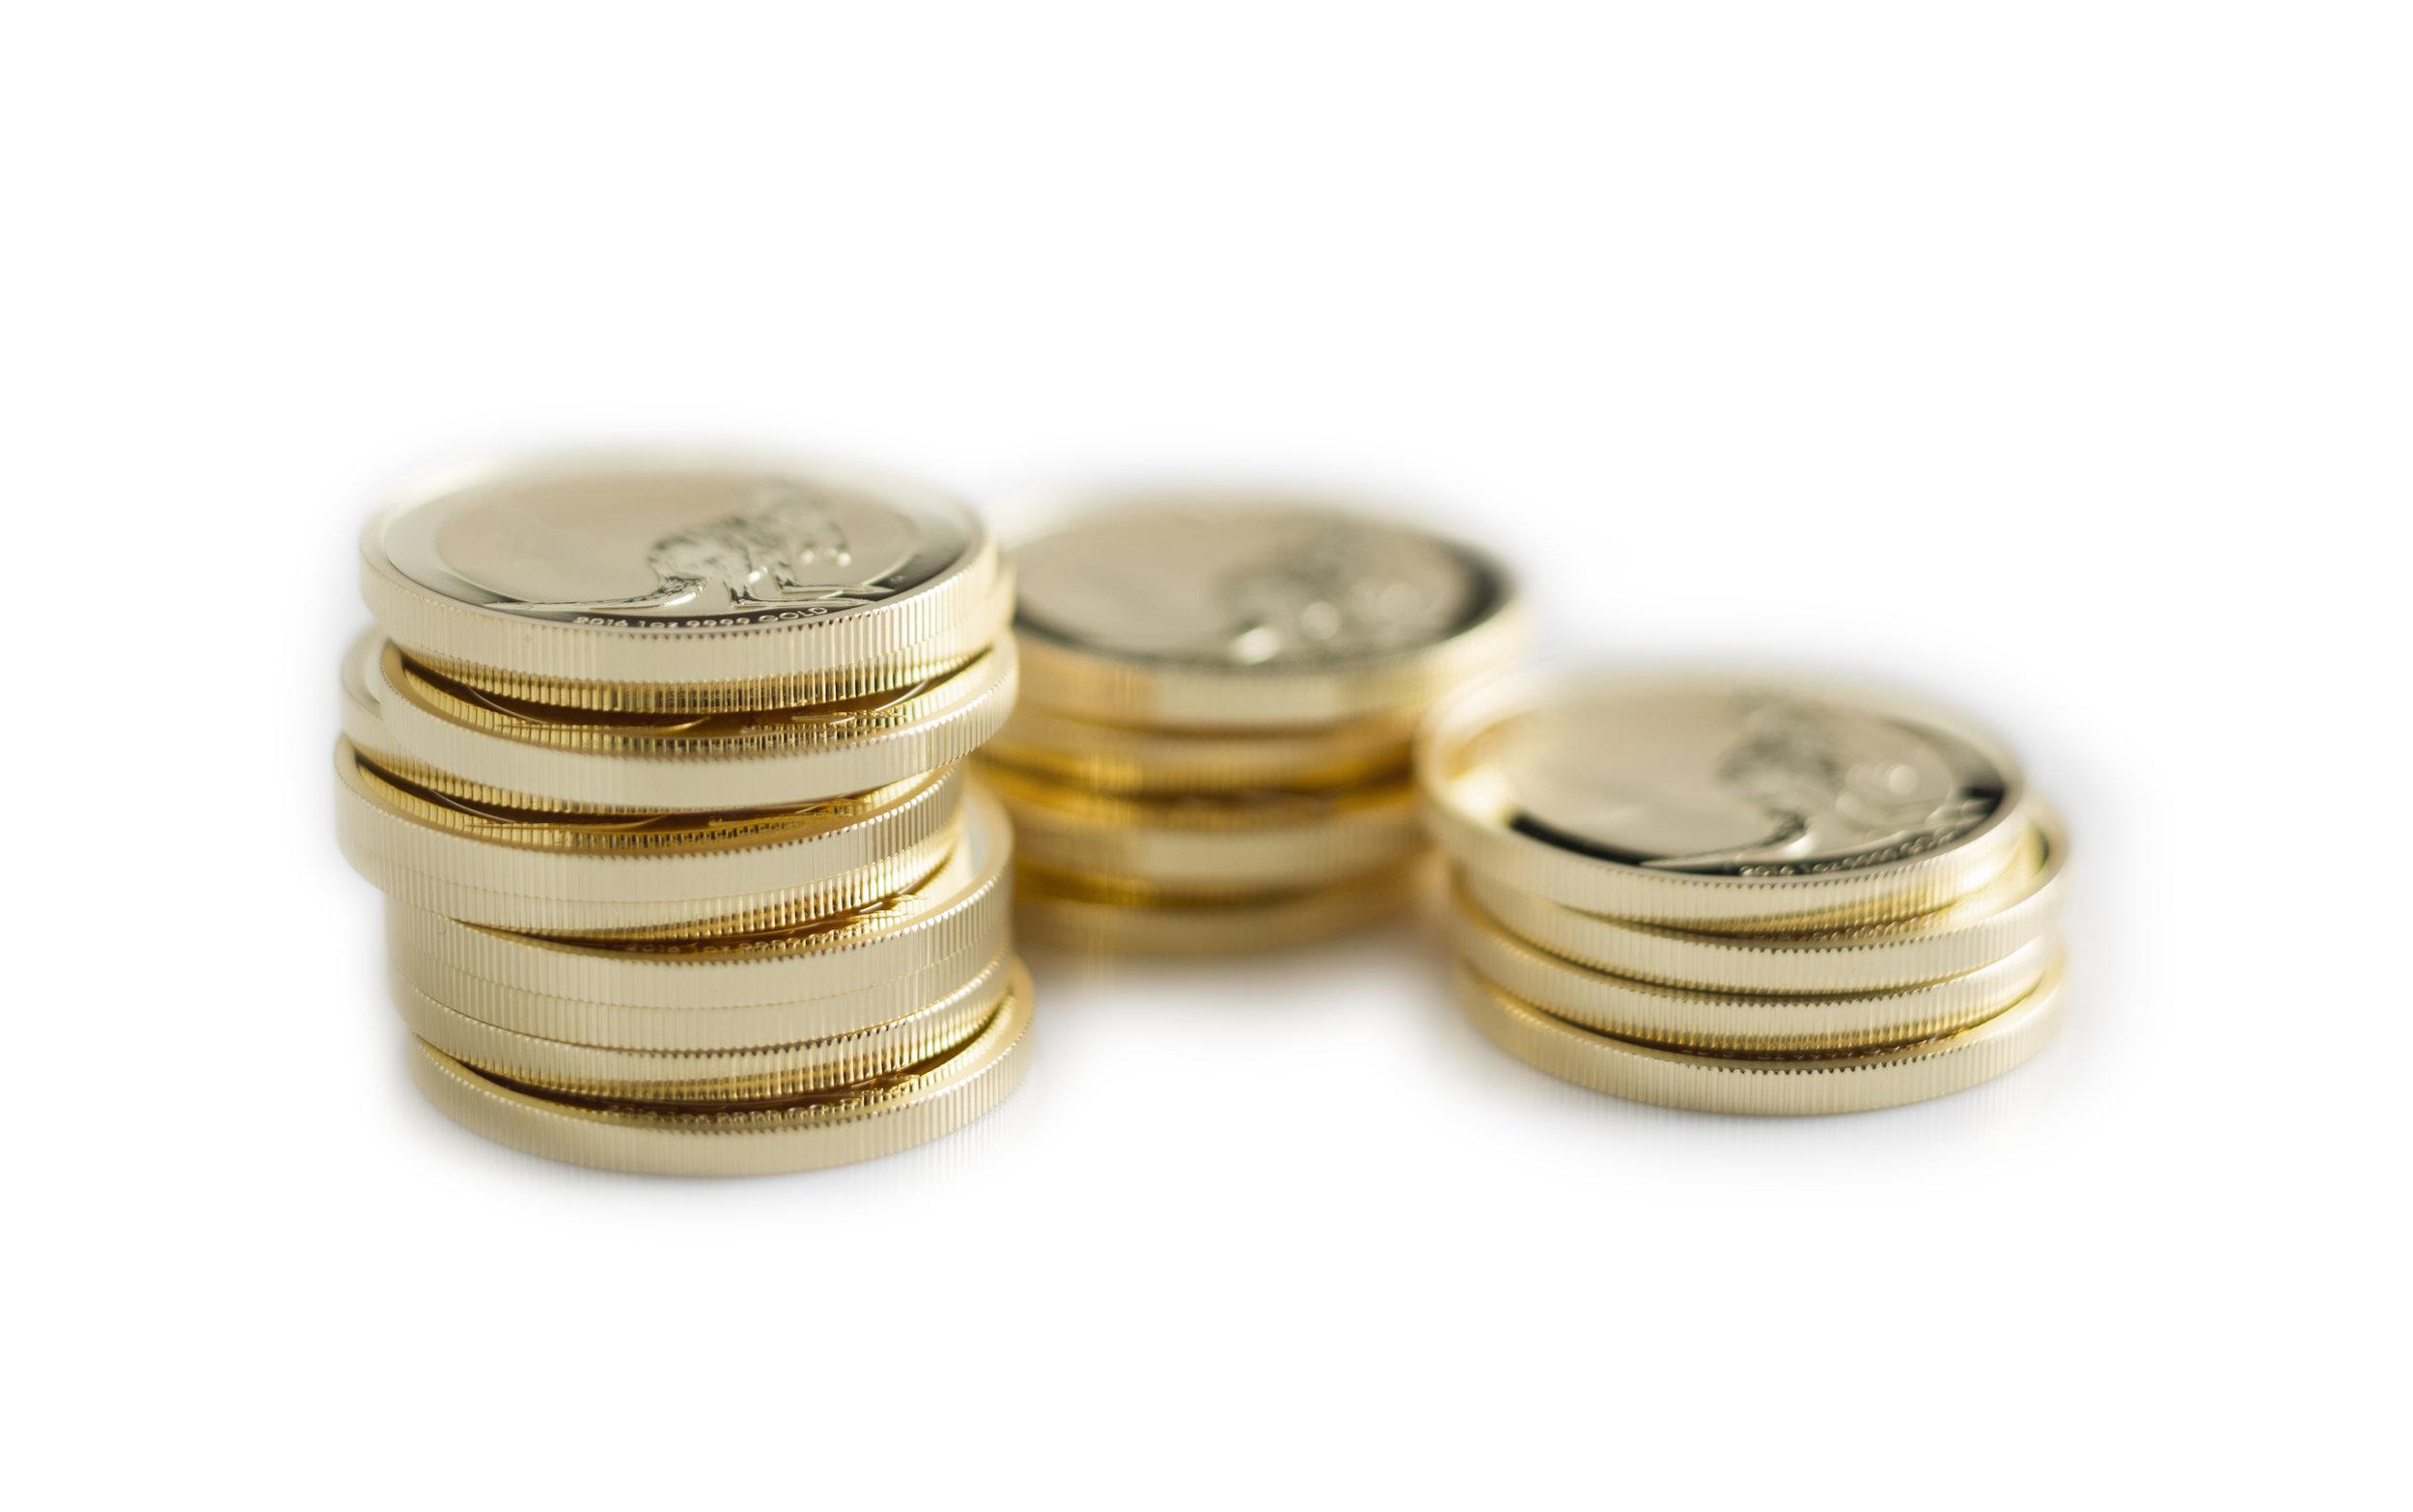 Perth Mint bullion coins